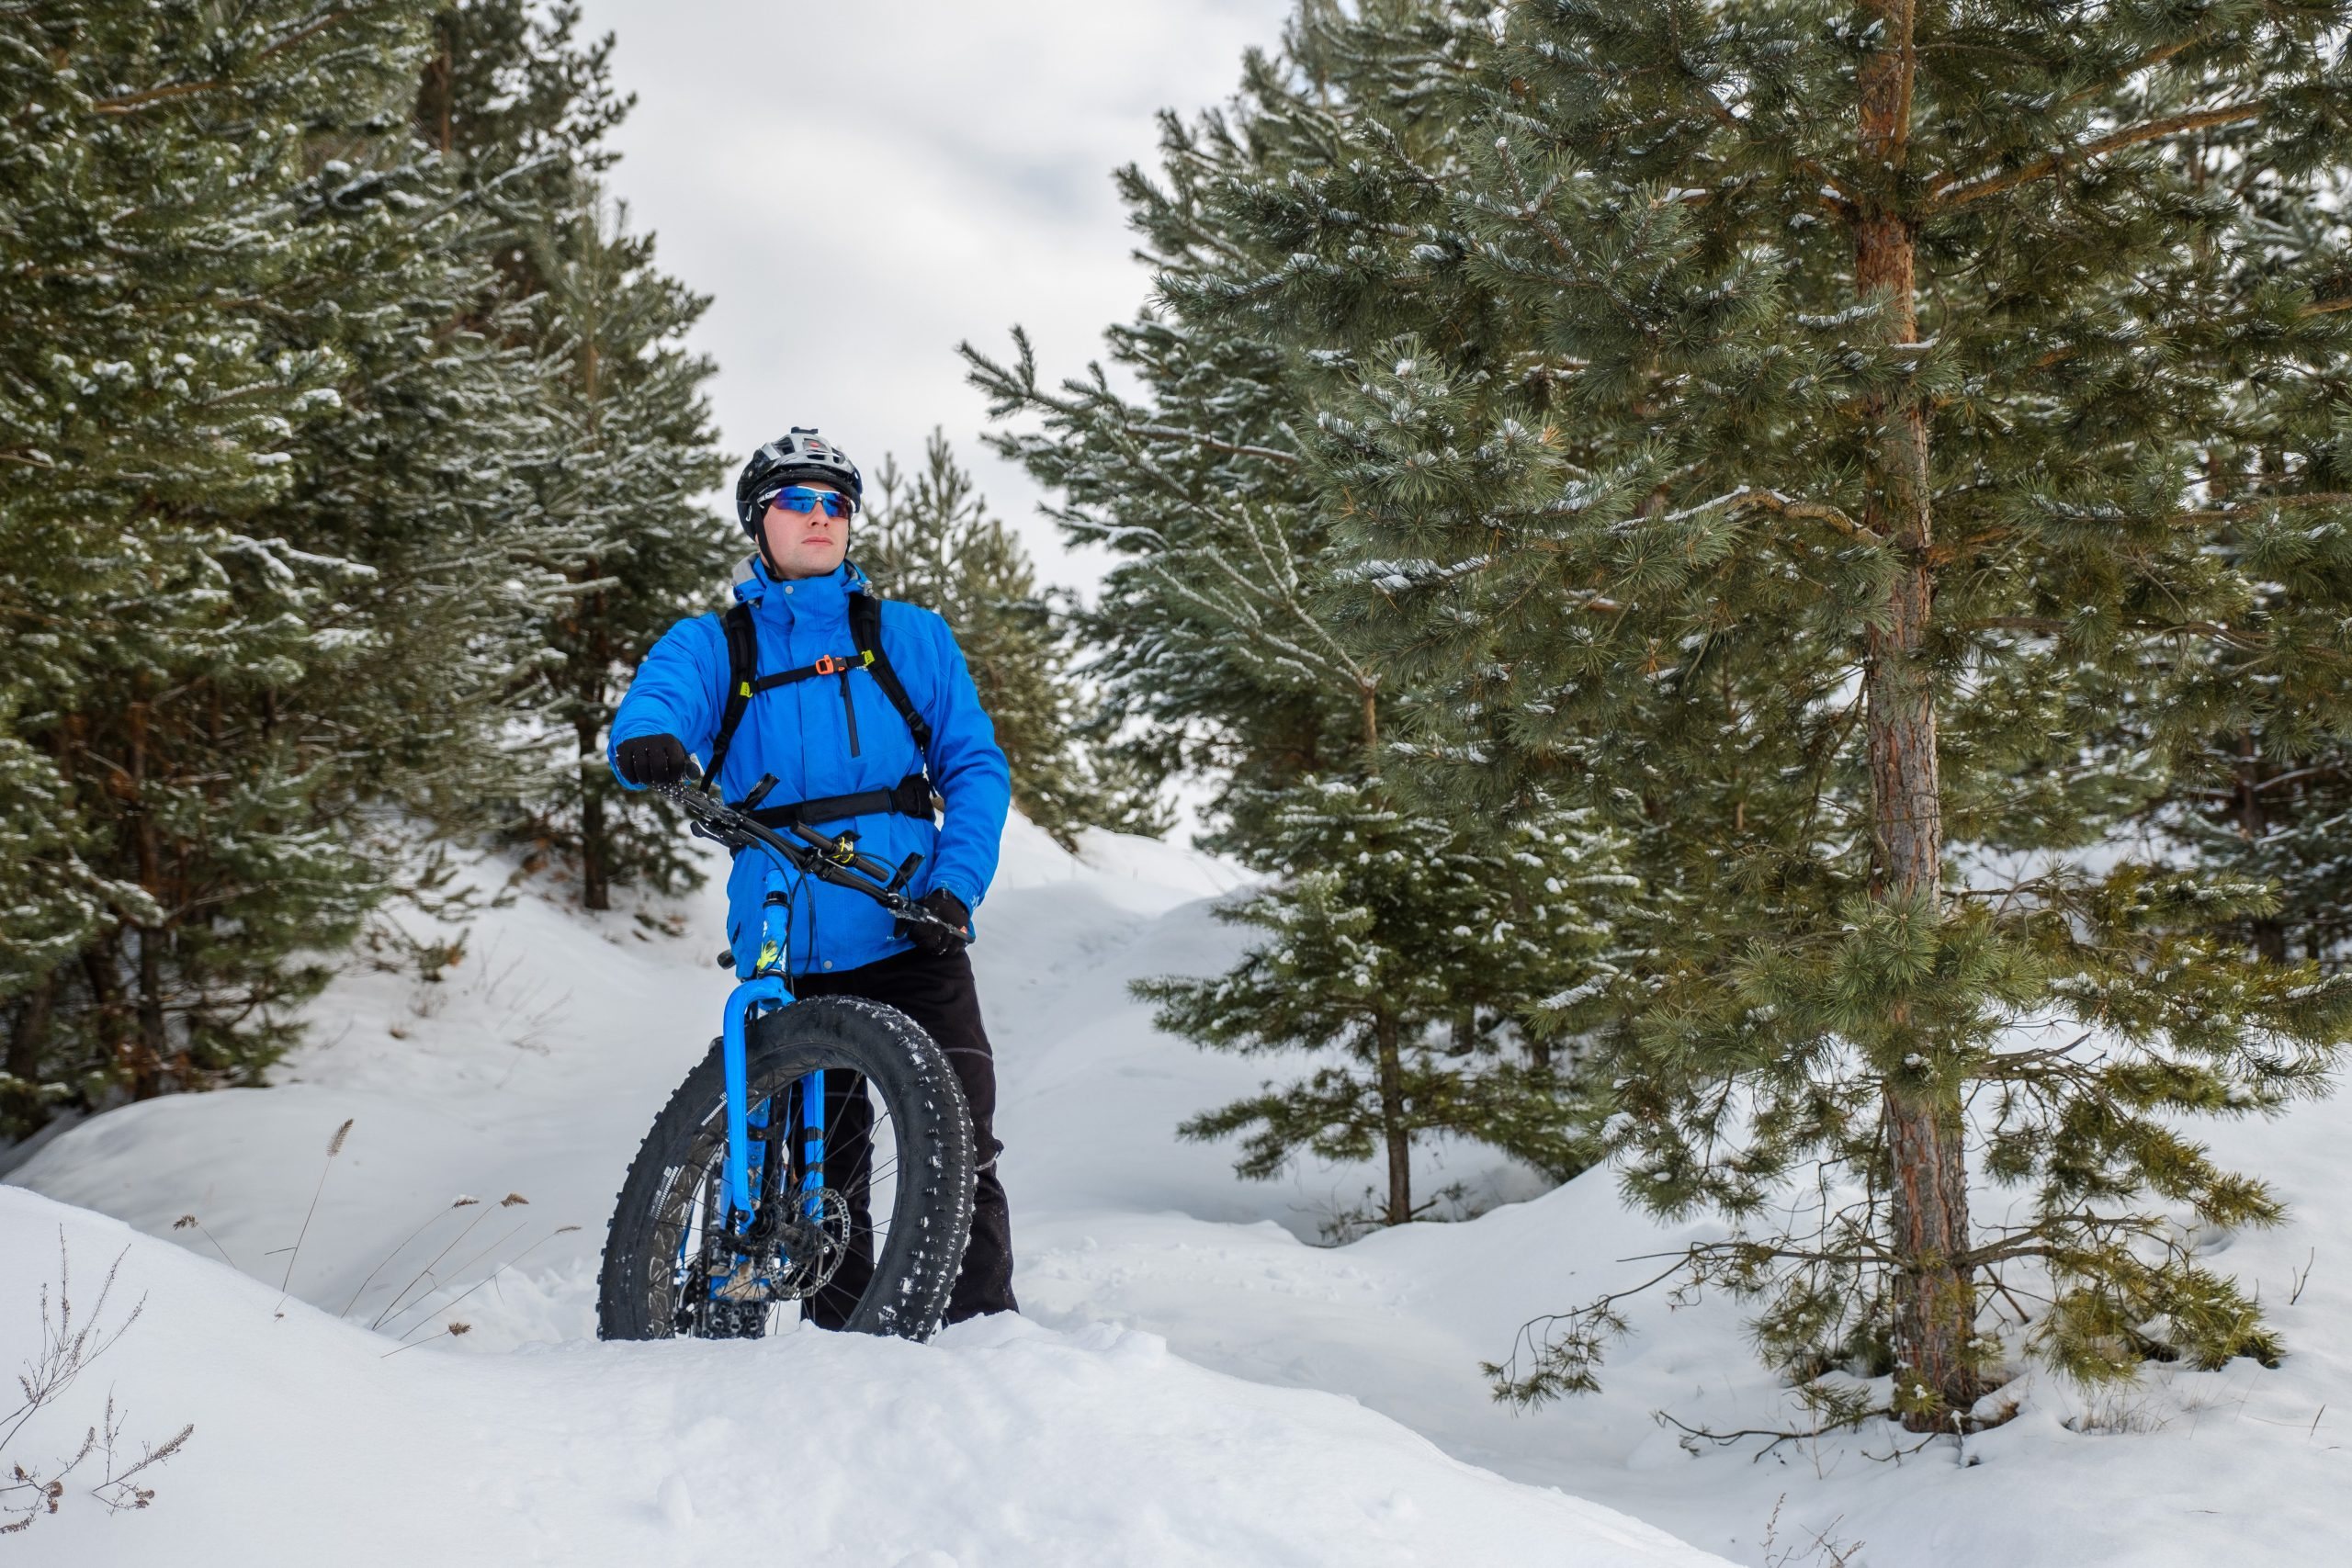 Man riding fat bike in snow